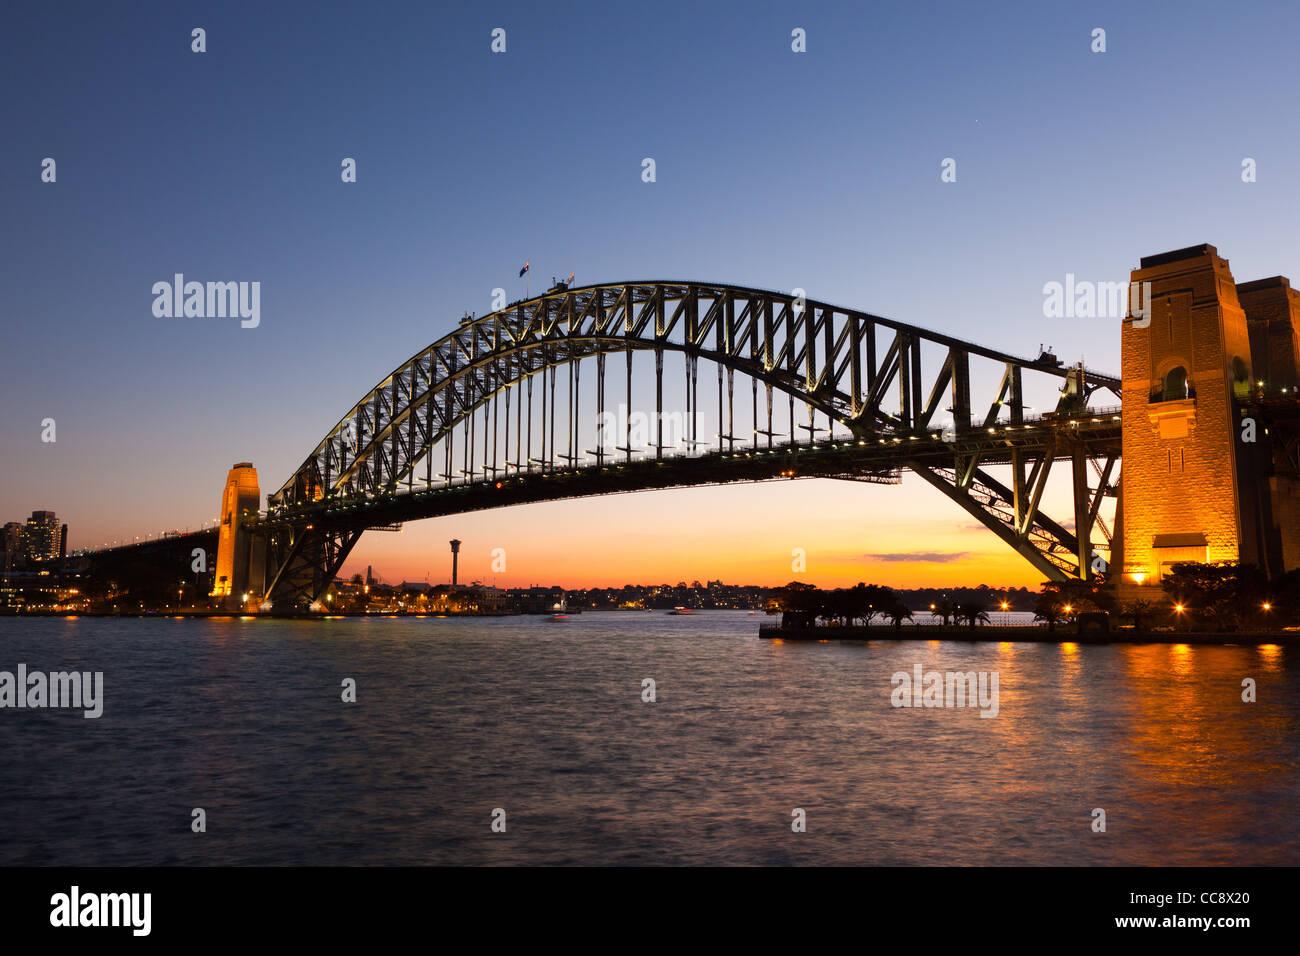 Sydney Harbour Bridge from Kirribilli at dusk - Stock Image